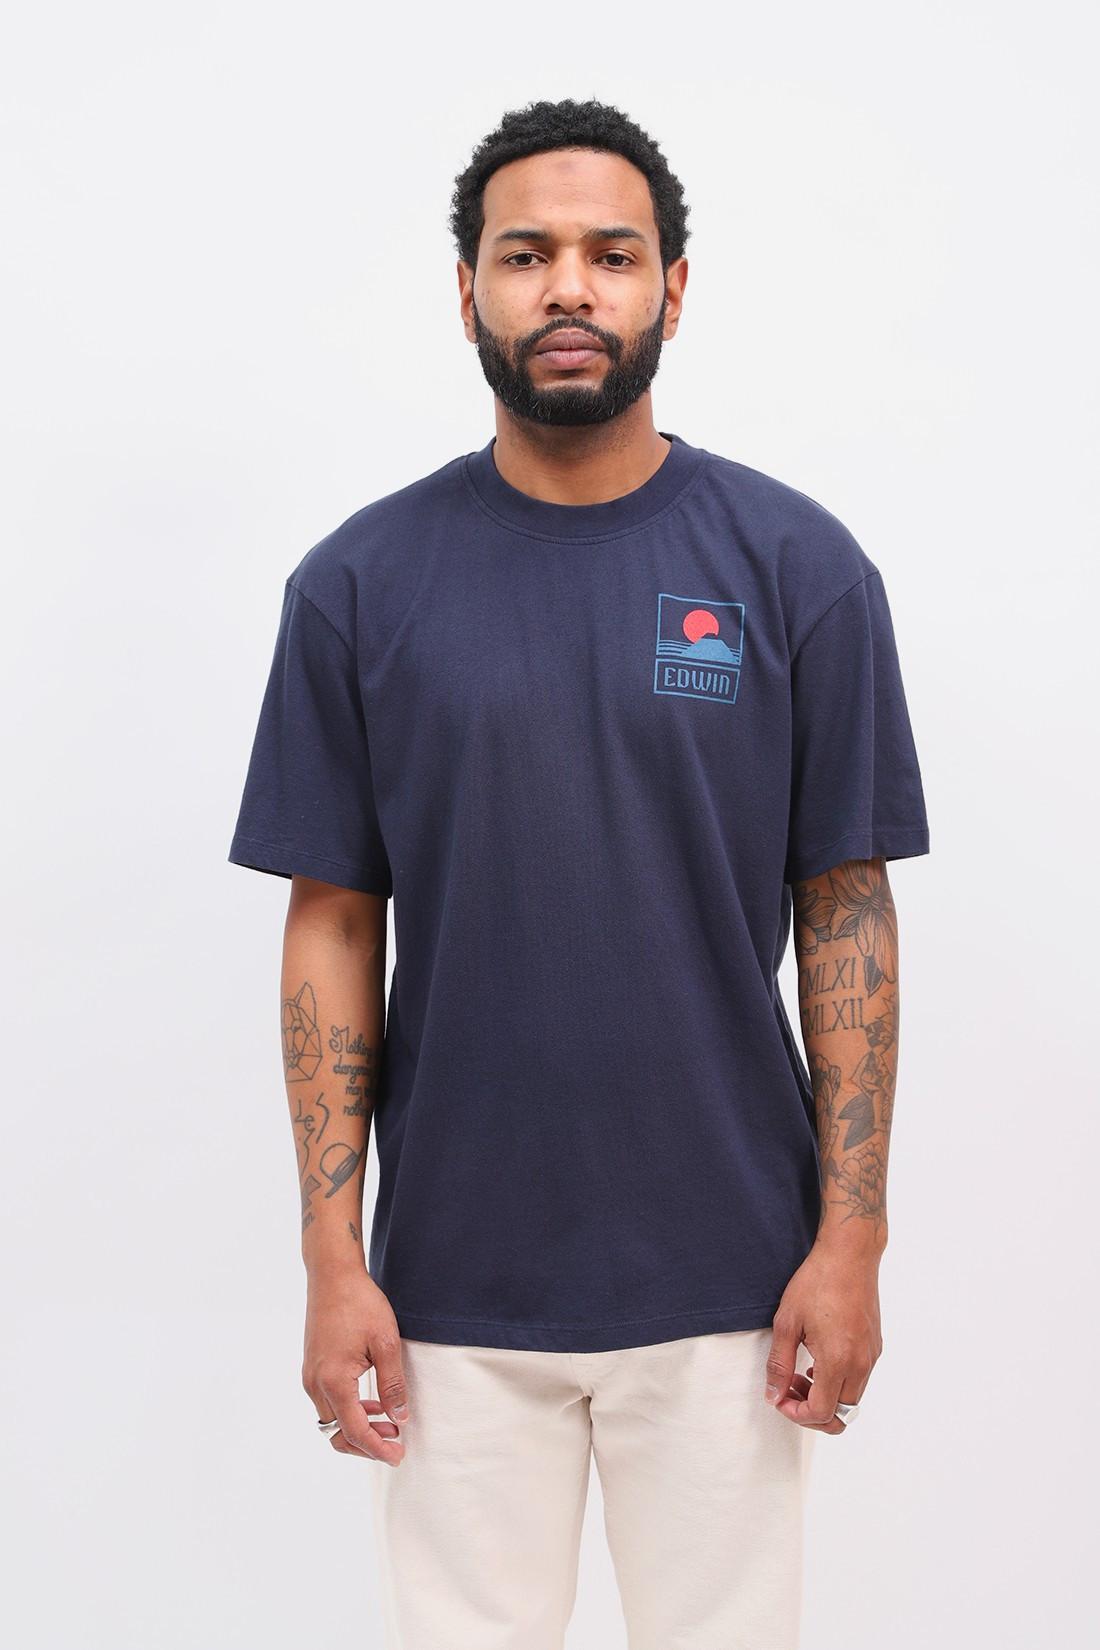 EDWIN / Sunset on mt fuji t-shirt Navy